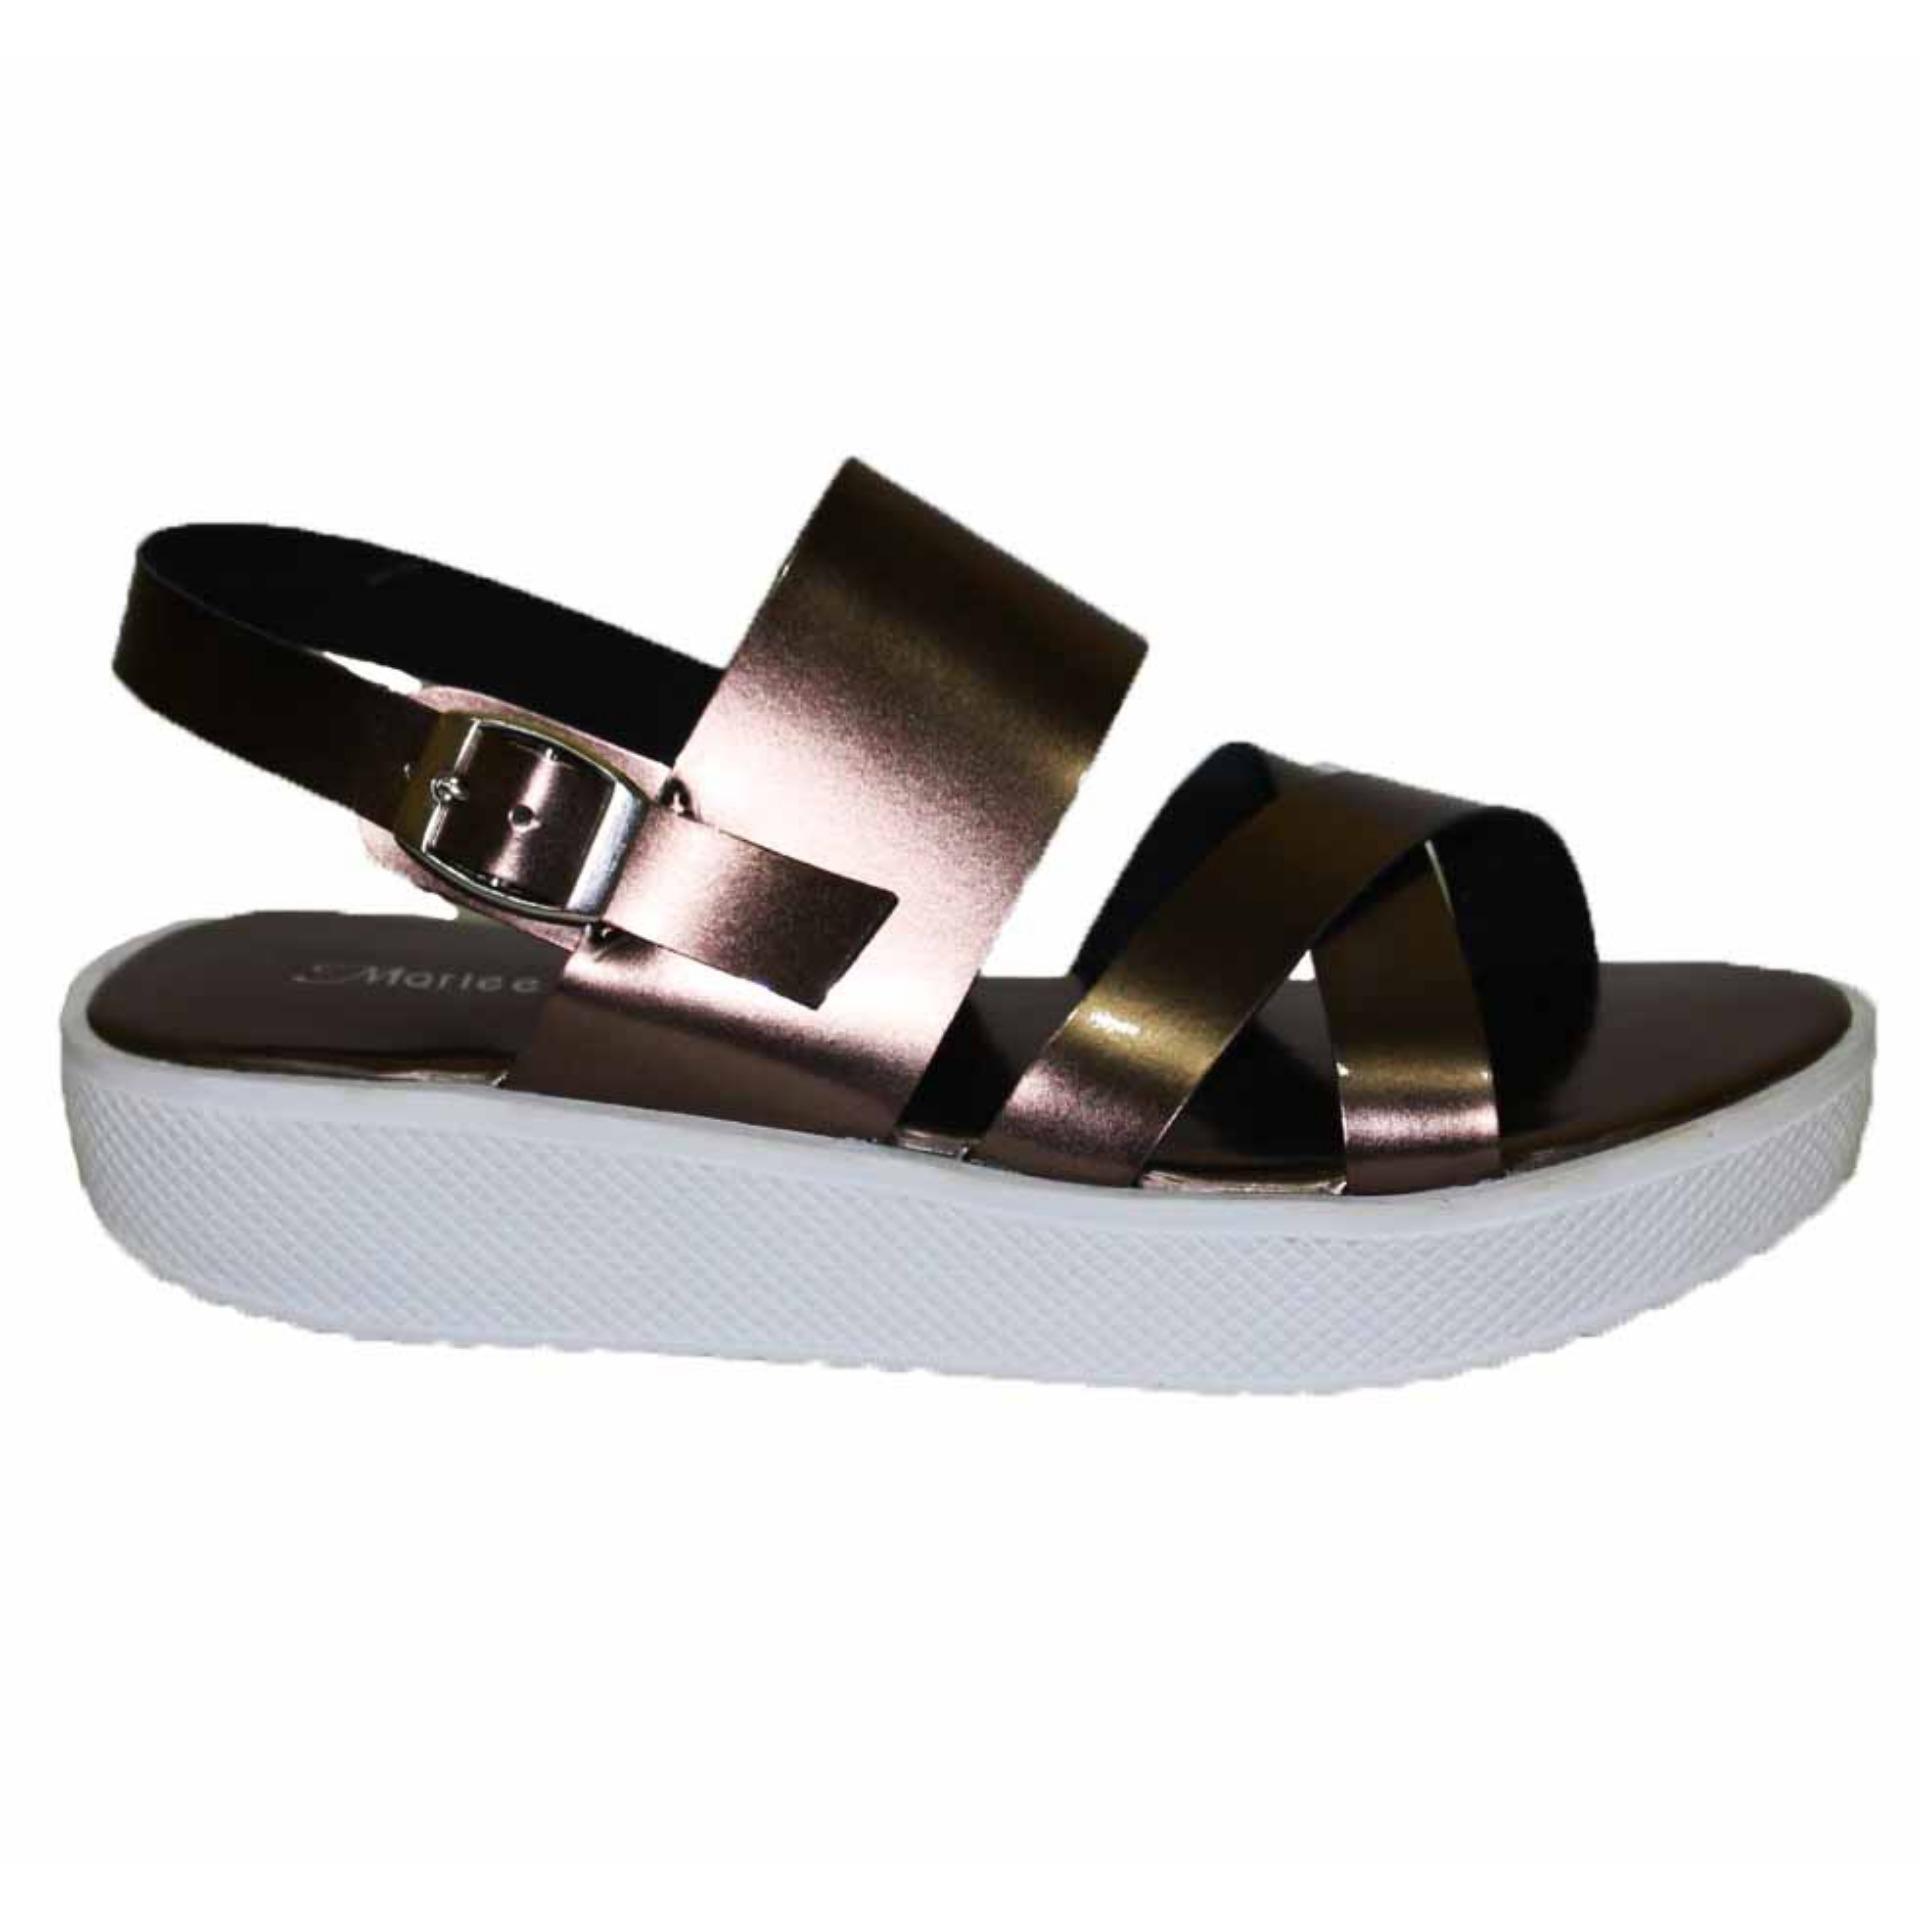 Marlee Dn 20 Sandal Flat Kunyit5 Terlengkap Anneliese Leony Sandal Flat Wanita Brown Ac 04 Plaform